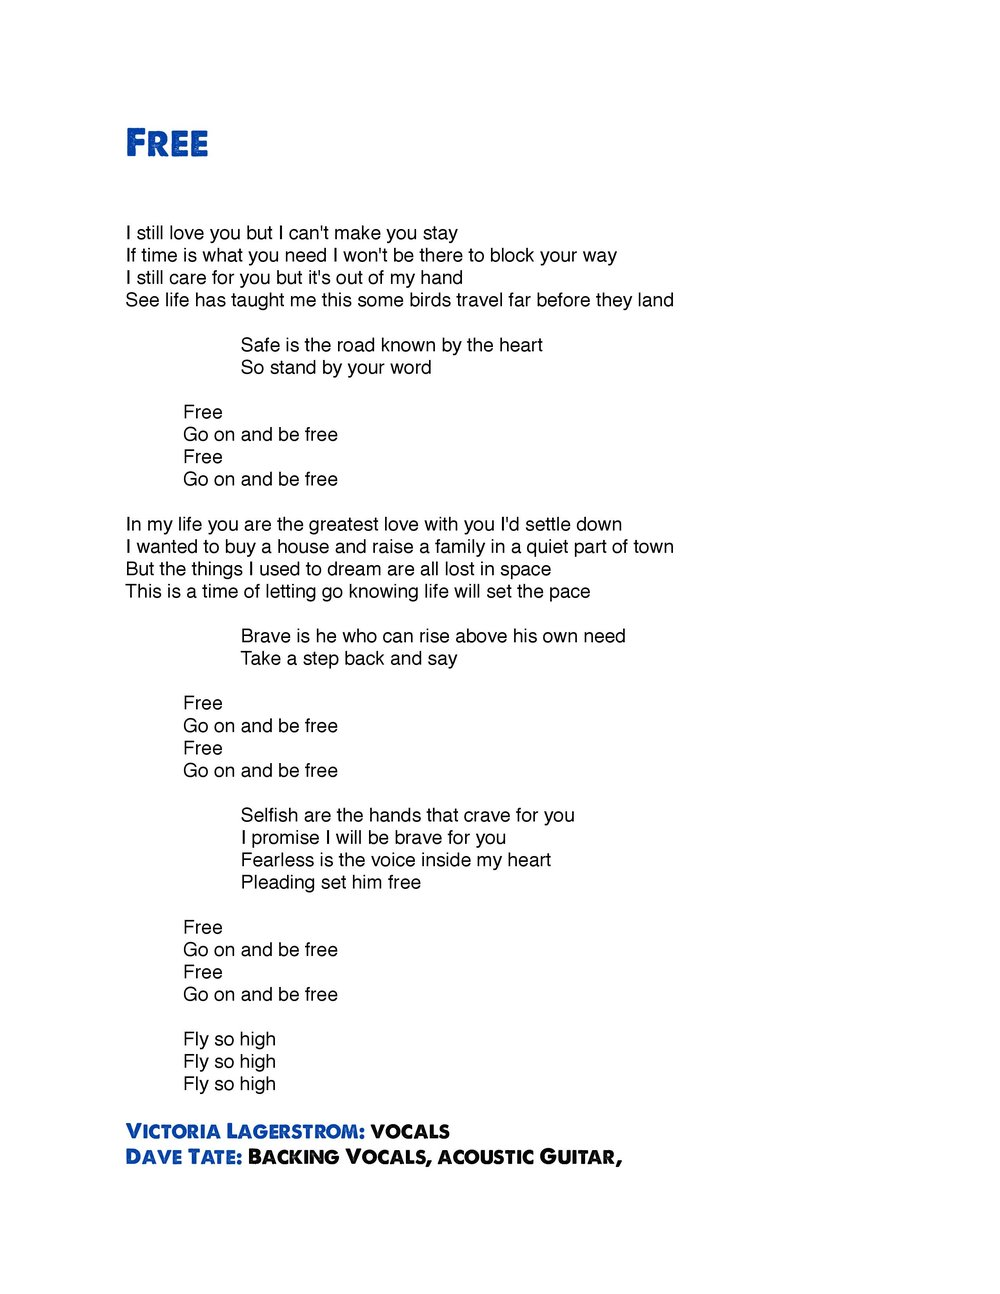 9 Free Lyrics-page-001.jpg